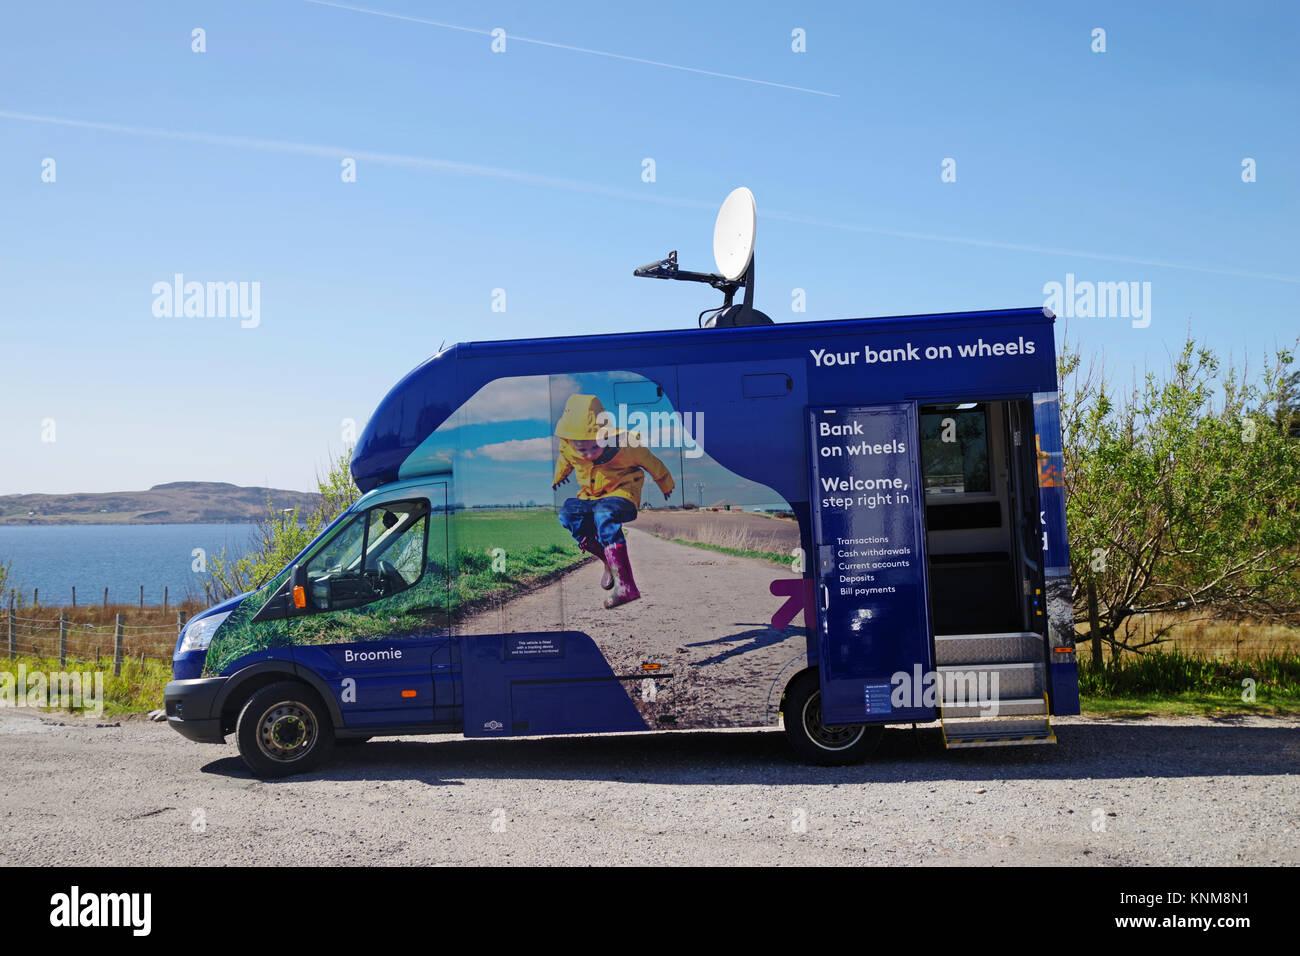 RBS Royal Bank of Scotland Mobile Bank Van at Achiltibuie, Wester Ross, Scottish Highlands, providing banking service - Stock Image